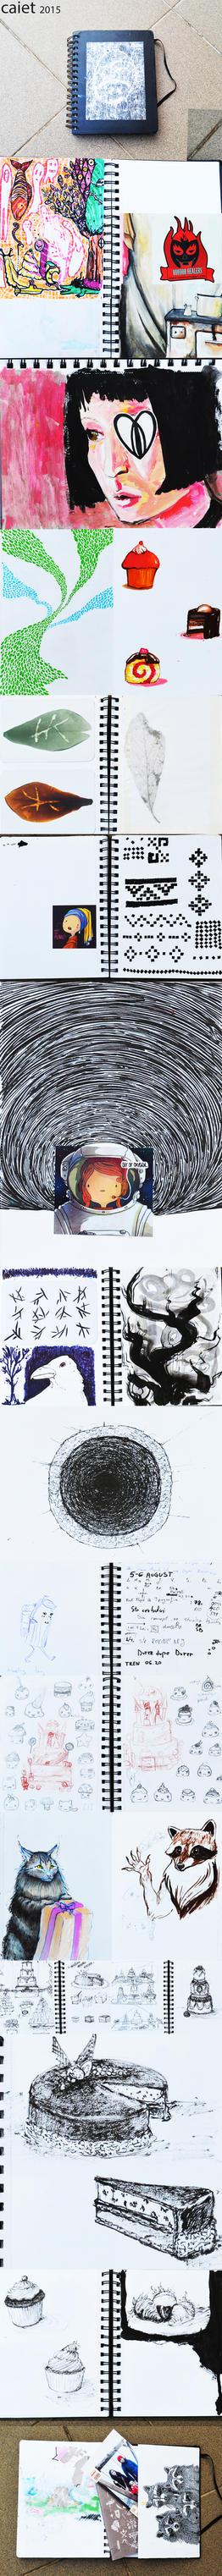 sketchbook dump by AnirBrokenear